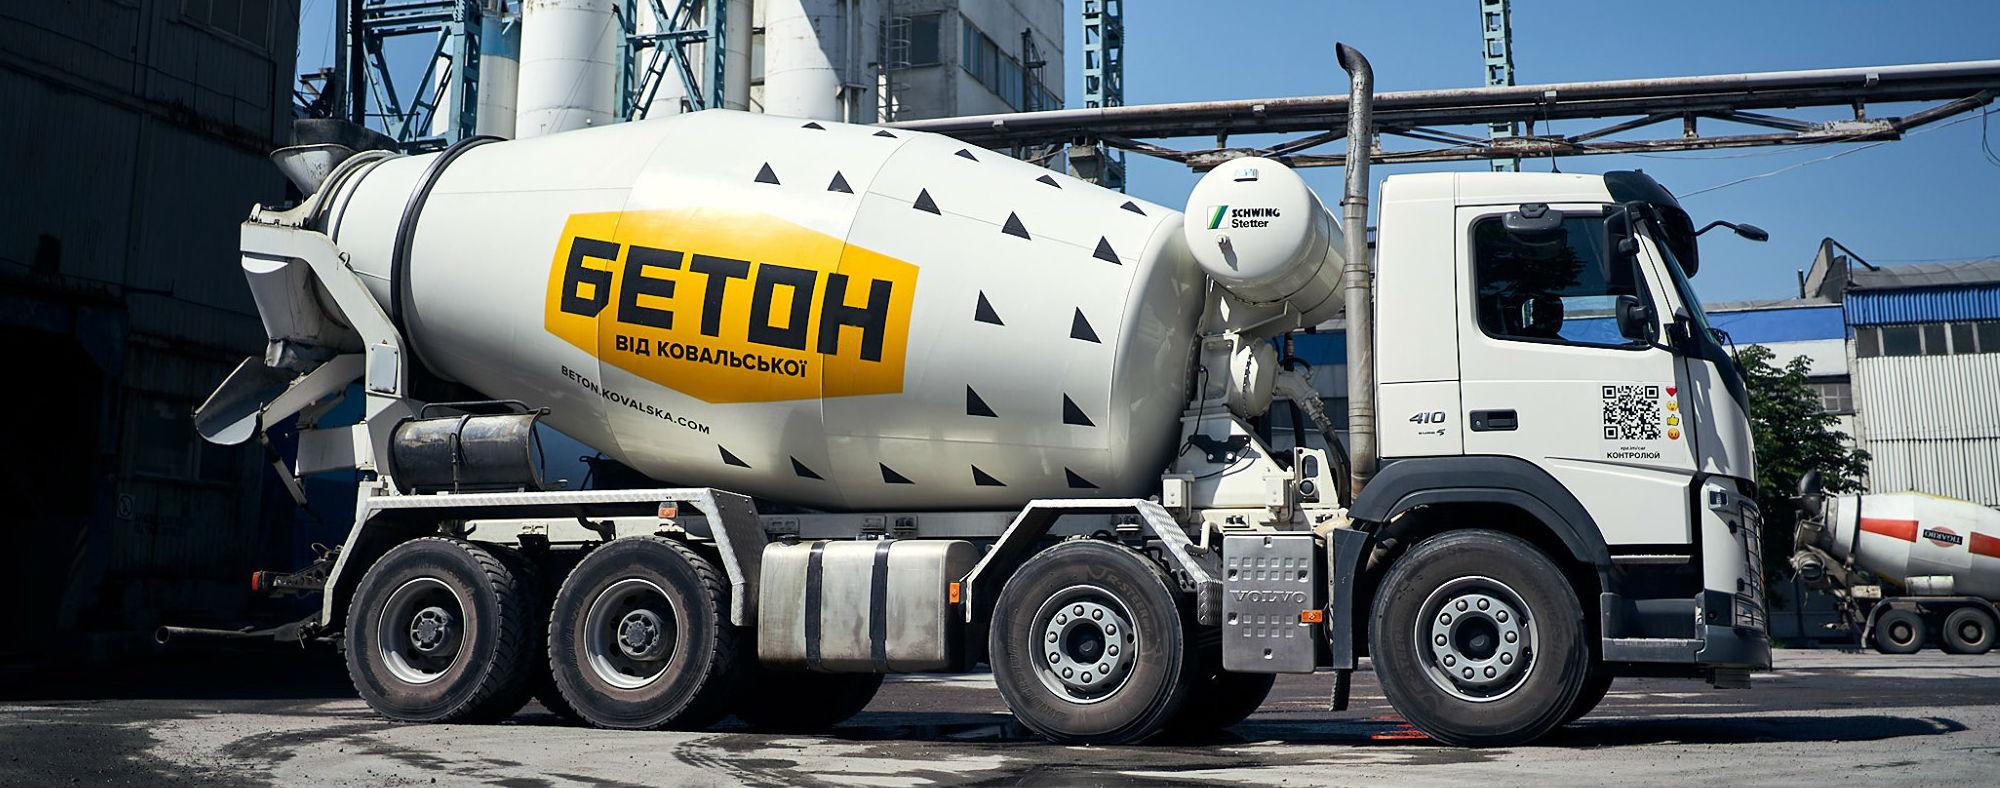 Ковальской бетон шлака бетон